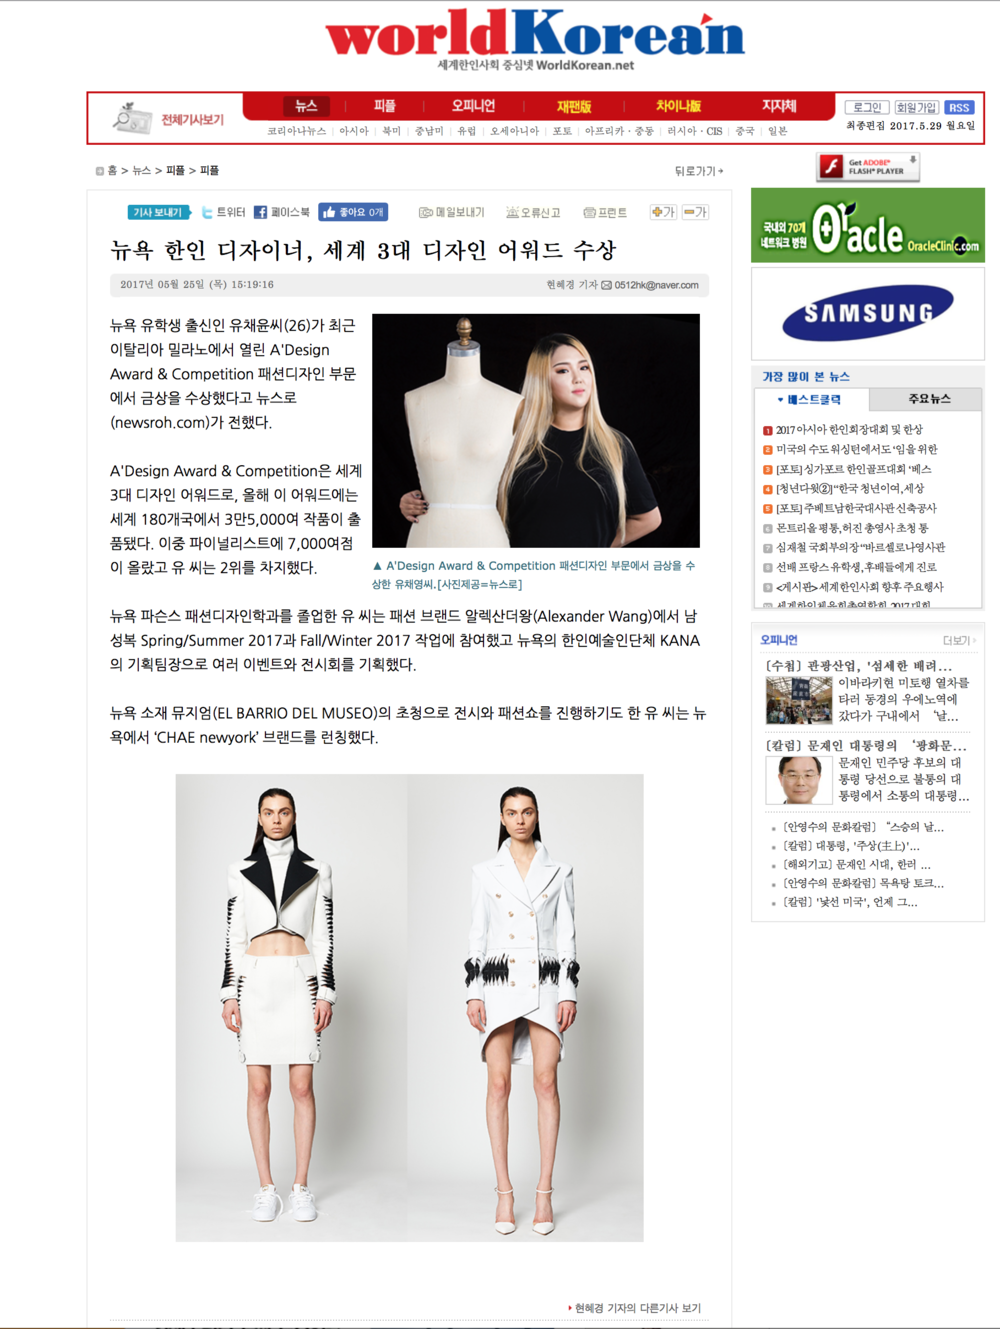 WOLRD KOREAN NEWS